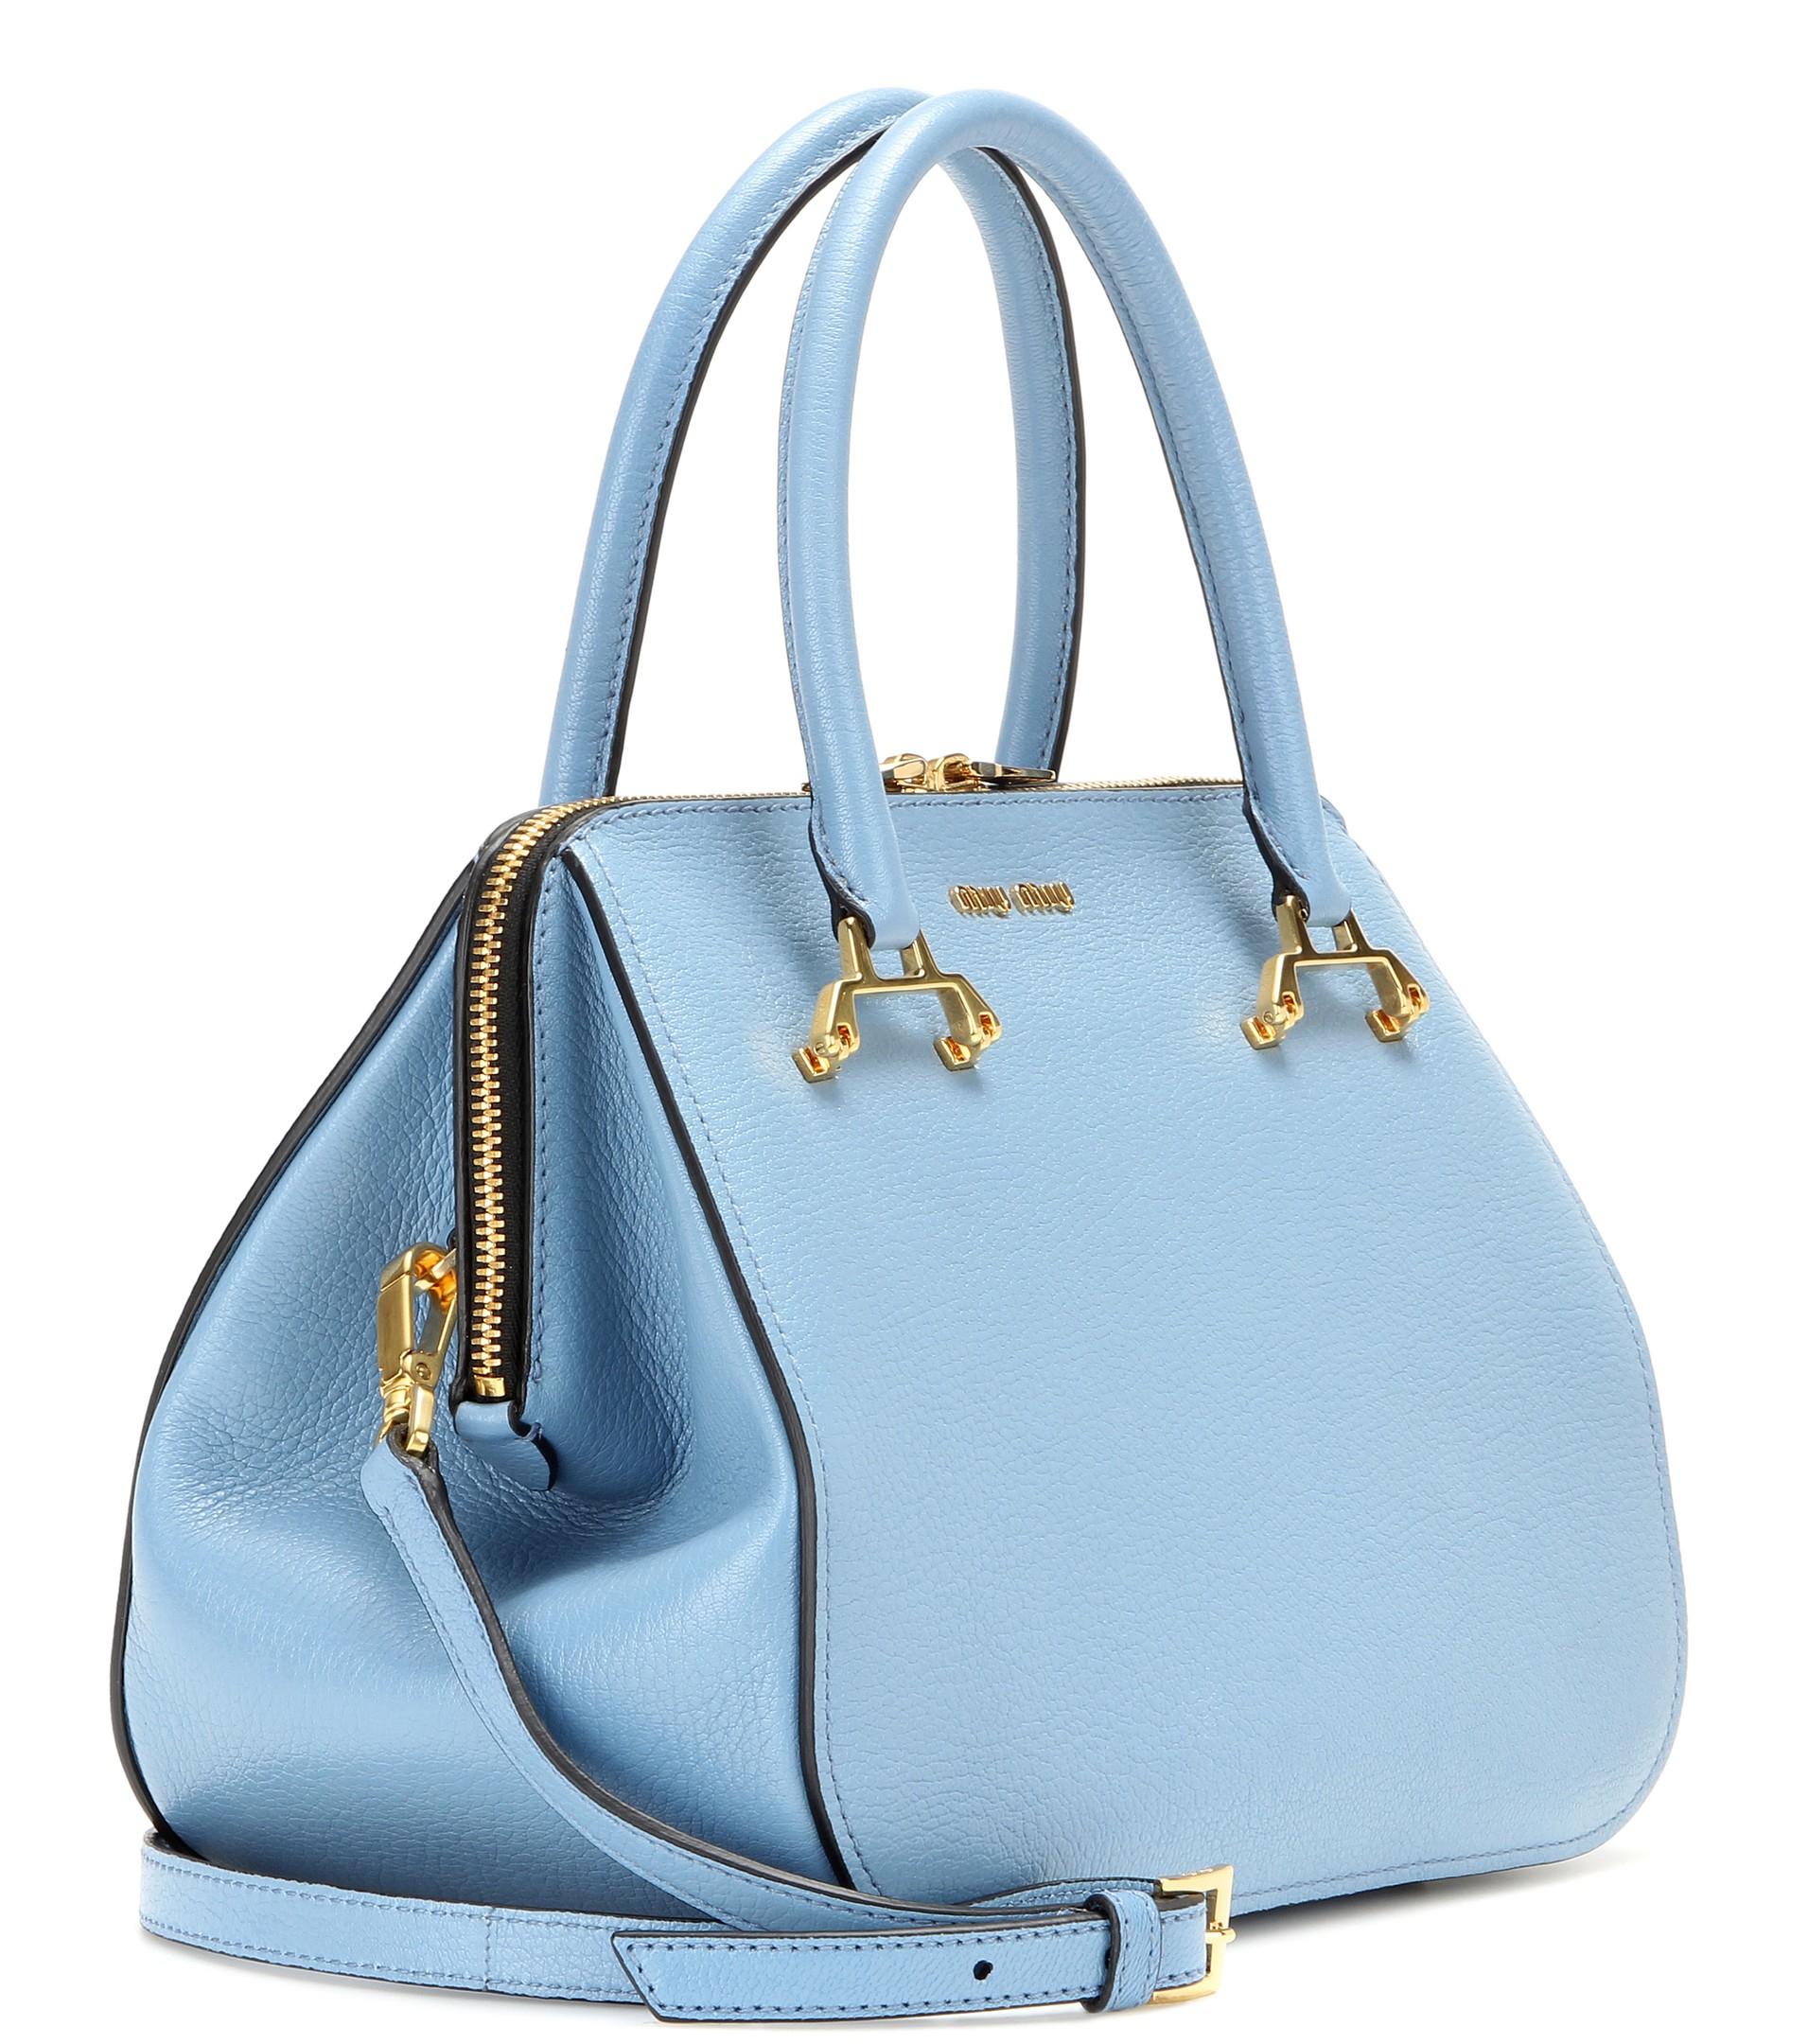 Miu Leather Shoulder Bag In Blue Astrale Lyst